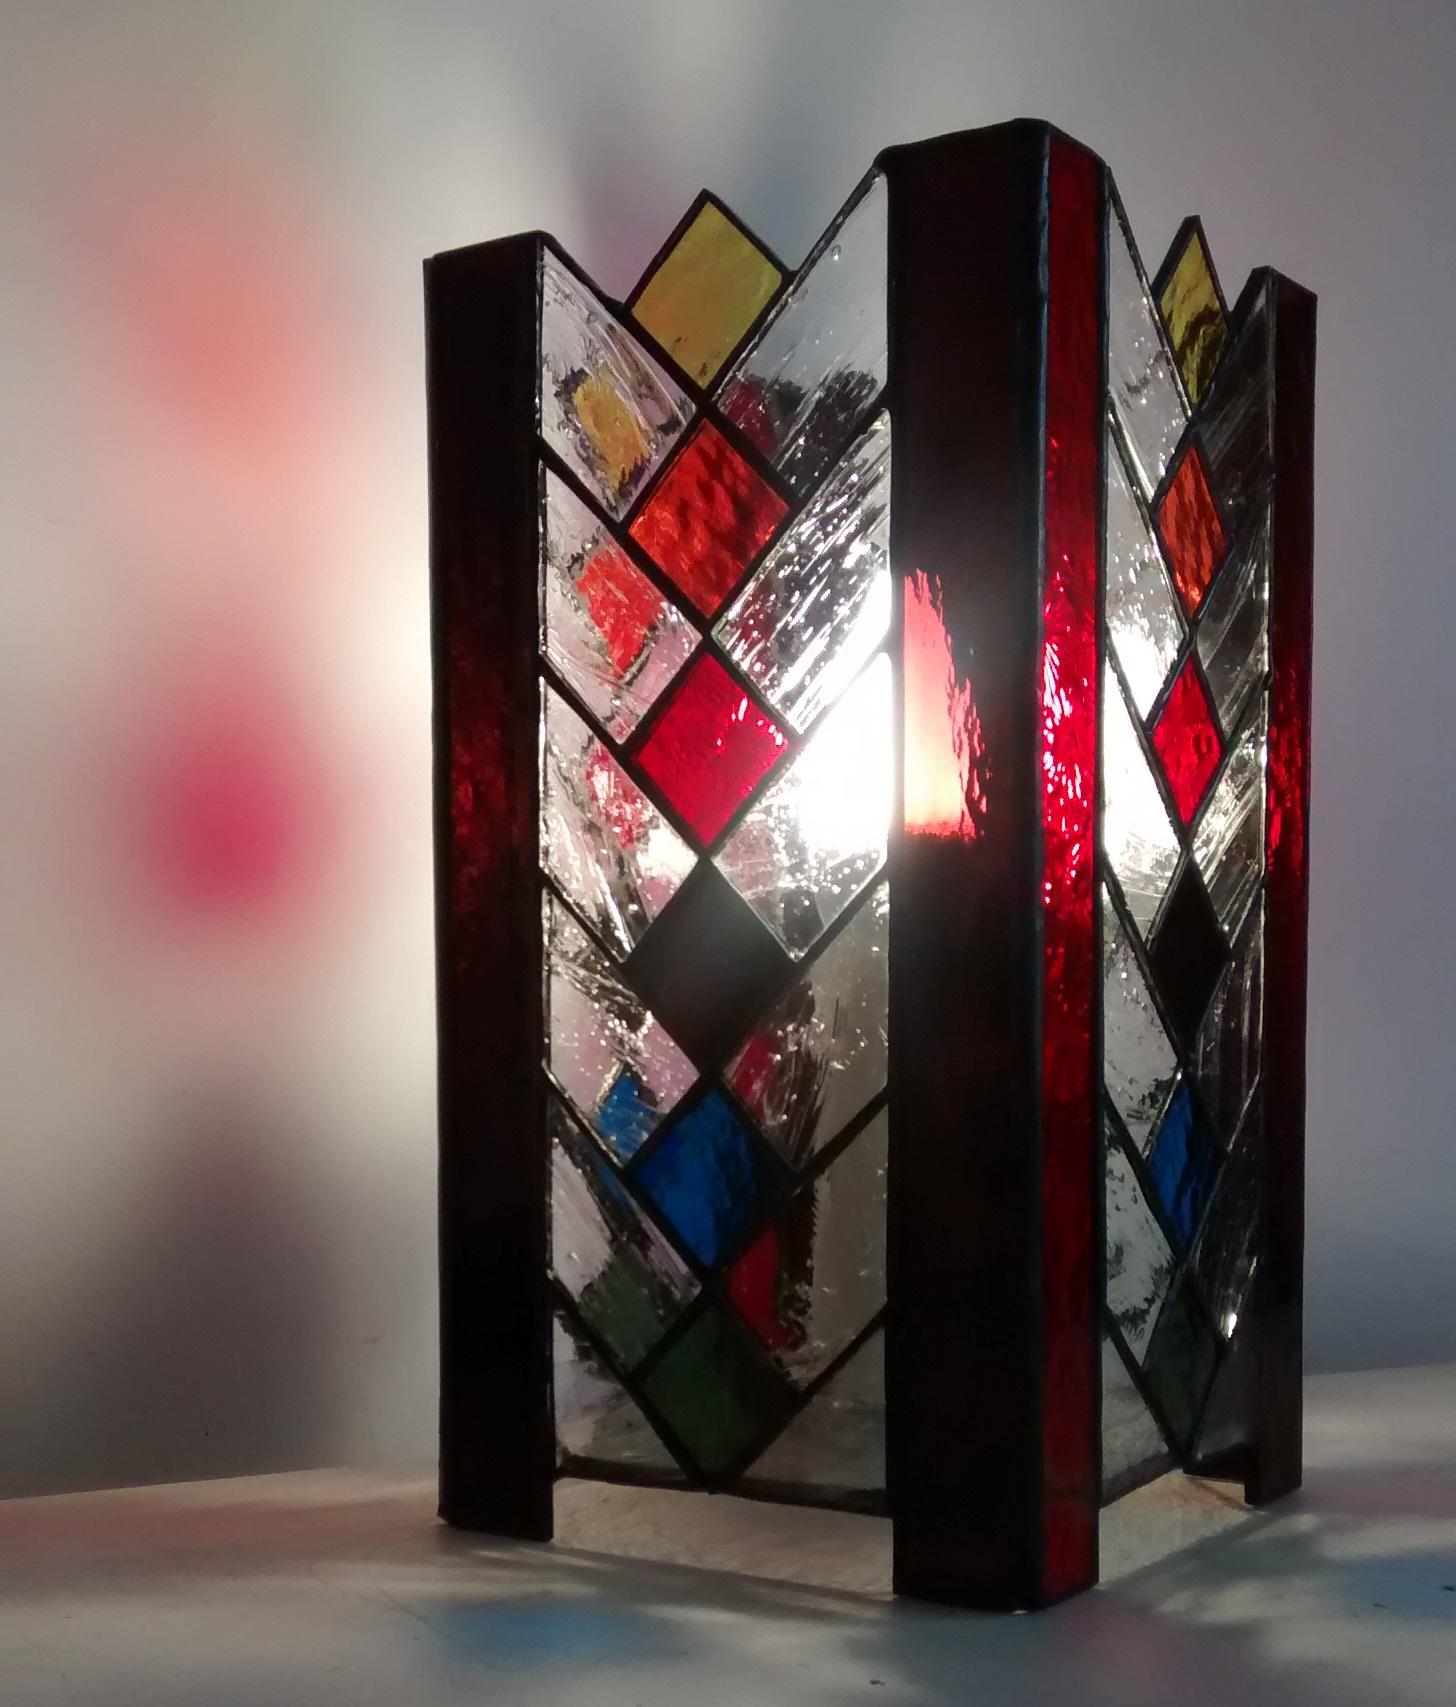 Lampe vitrail Tiffany Arlequin